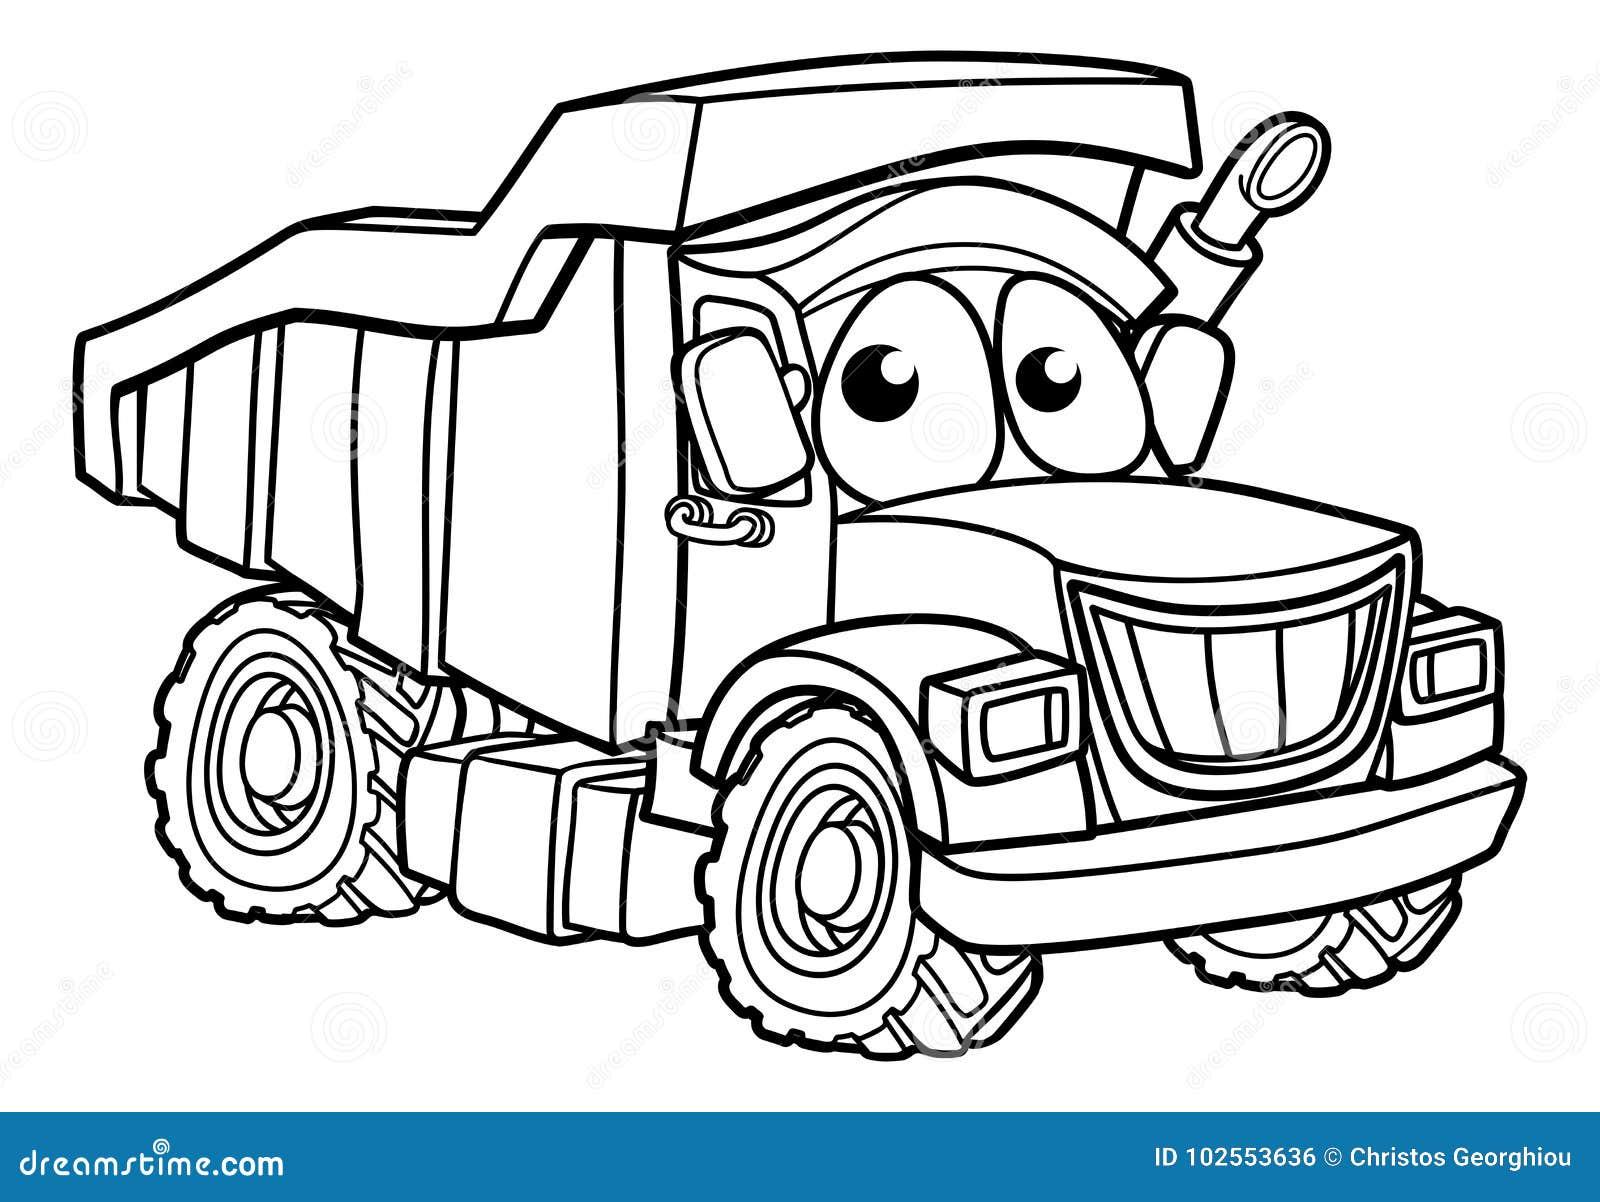 Cartoon Character Dump Truck Stock Vector - Illustration ...